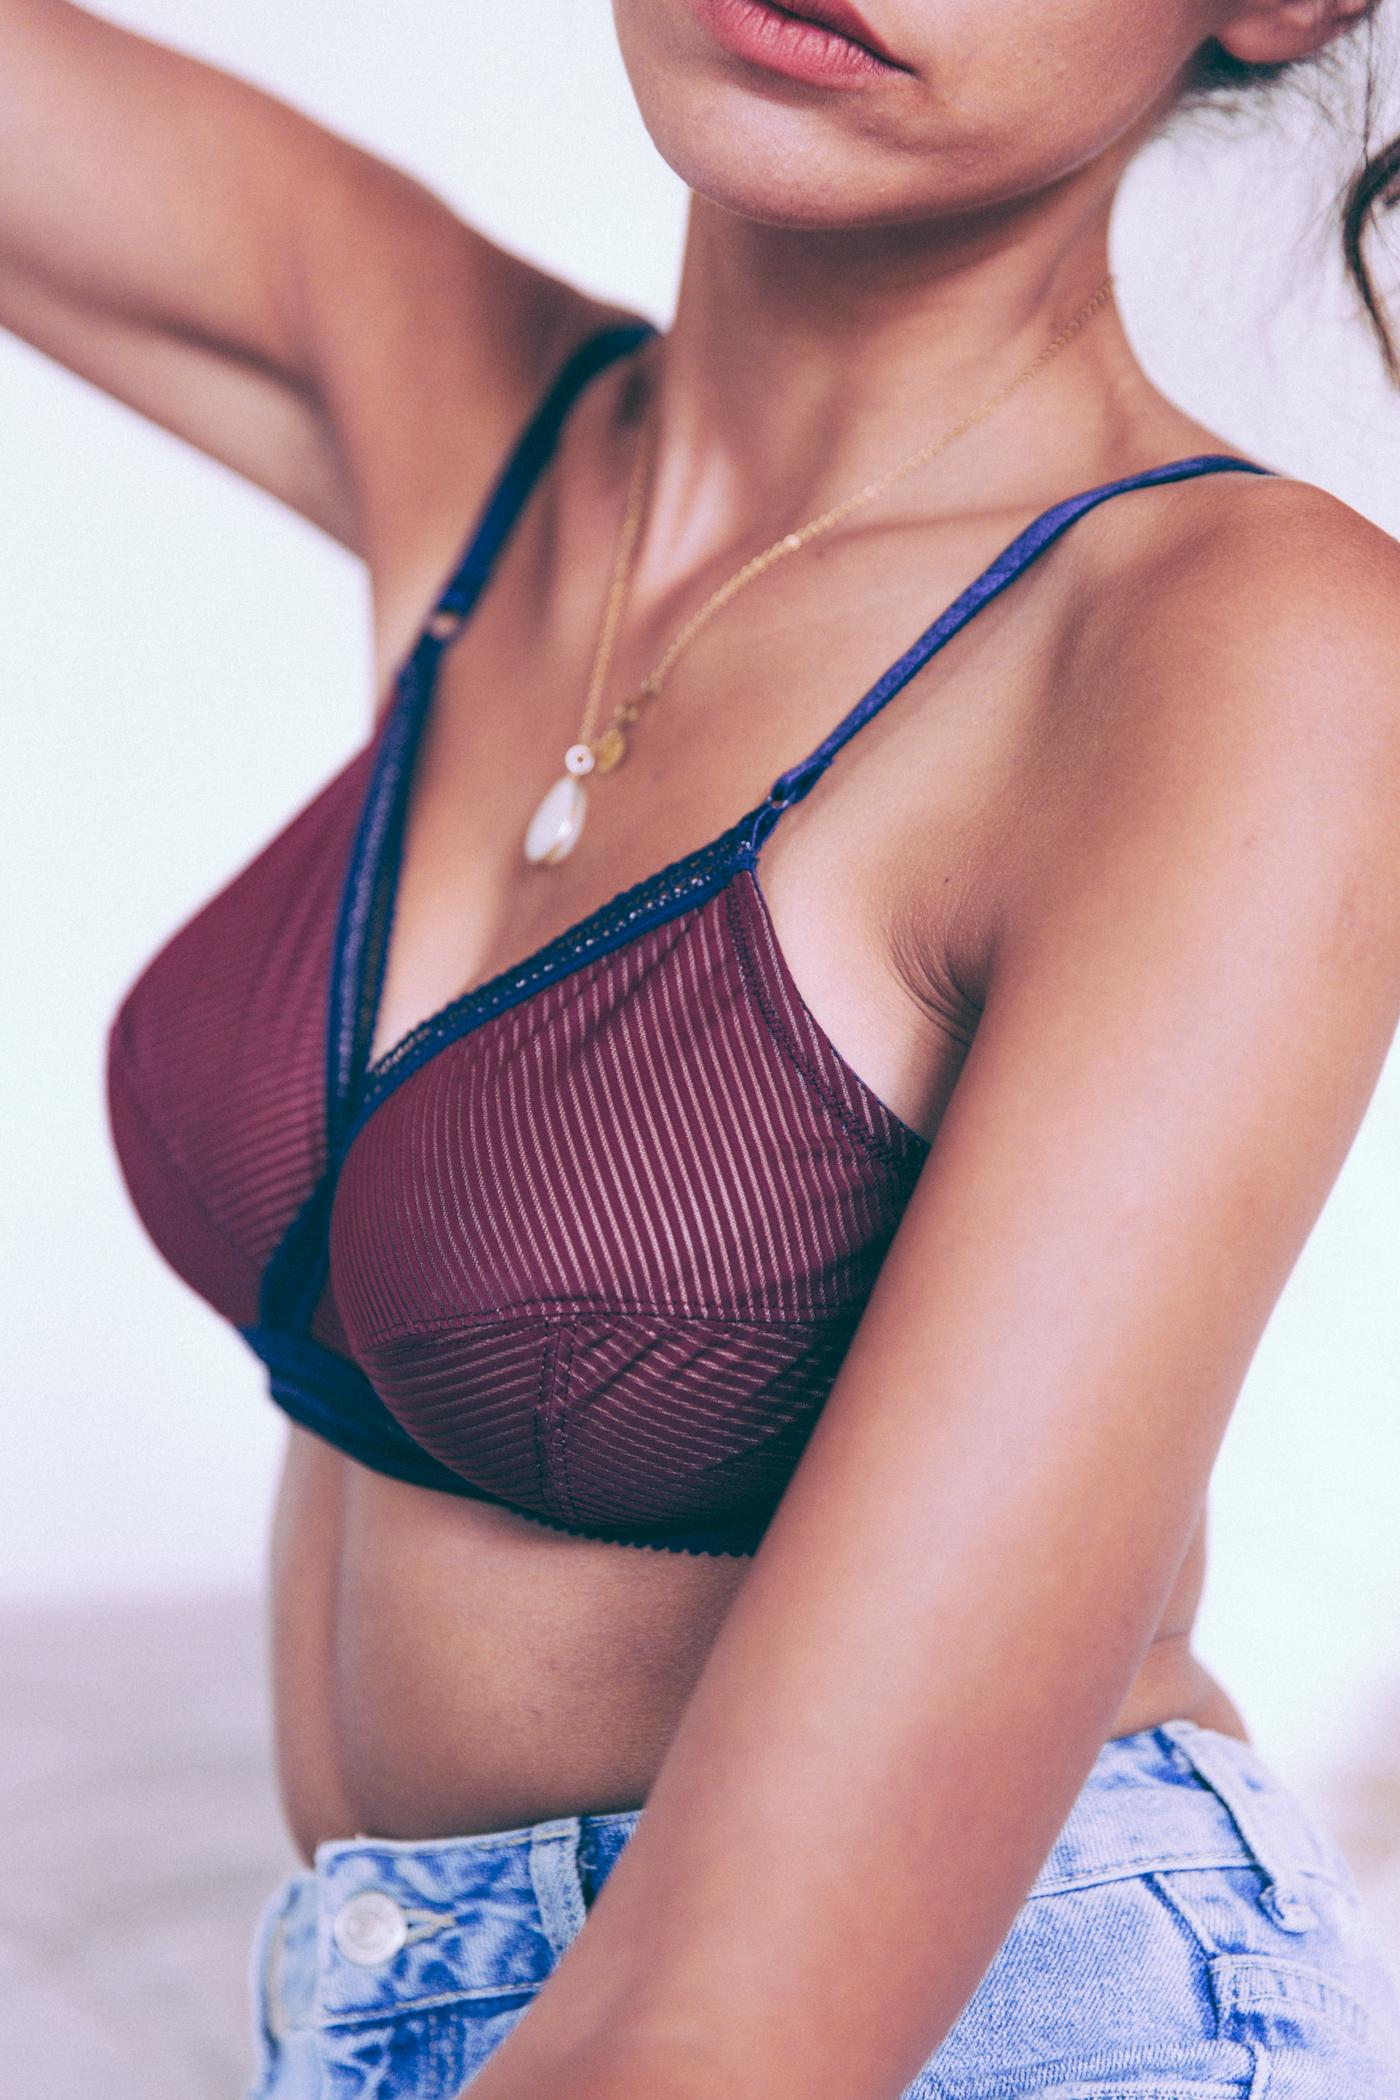 Playtex collection 2018 Zoe Felic Sporty chic et smoking chic - blogueuse mode parisienne - modèle lingerie collaboration - blog mode lingerie humeur cuisine lifestyle